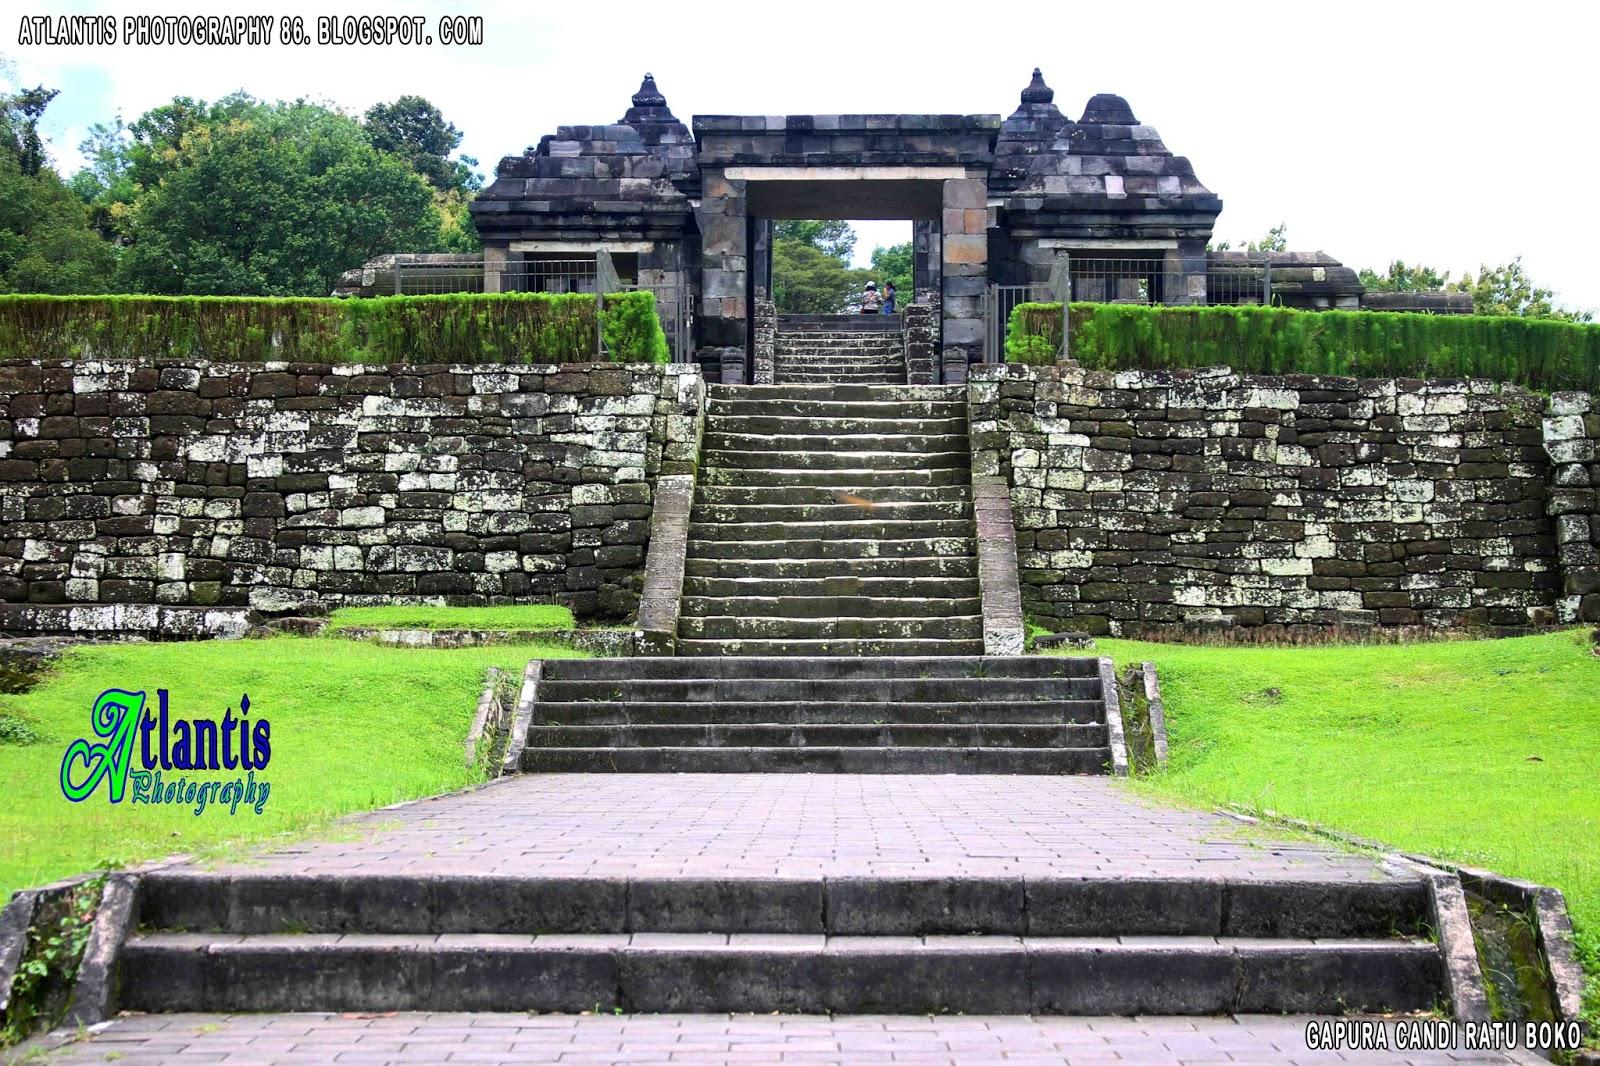 Atlantis Photography Krui Candi Ratu Boko Sleman Yogyakarta Bagian Area